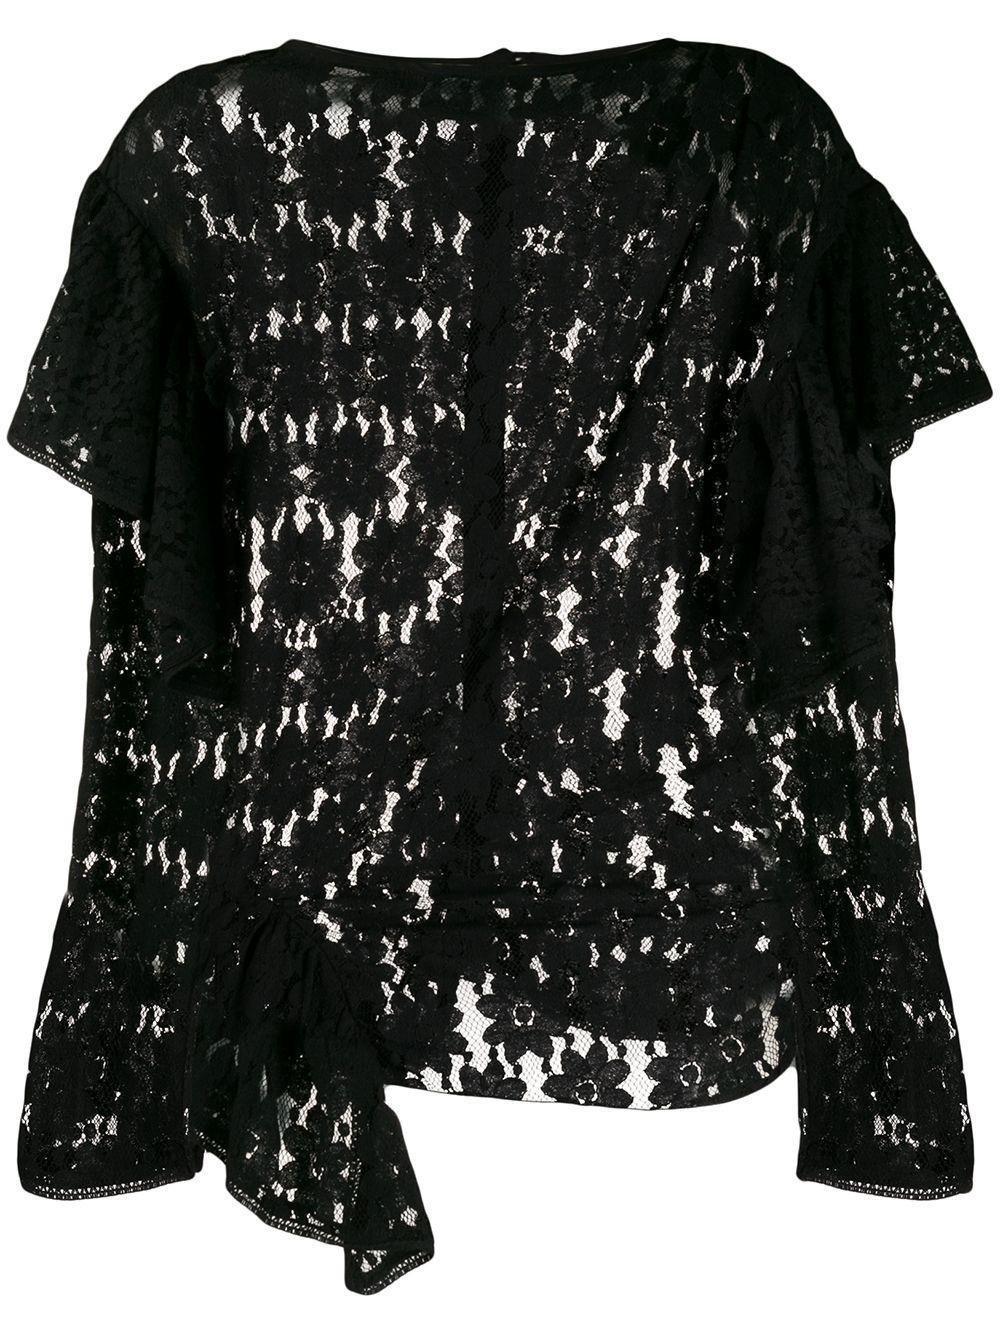 Long Sleeve Draped Lace Top Item # VINNY